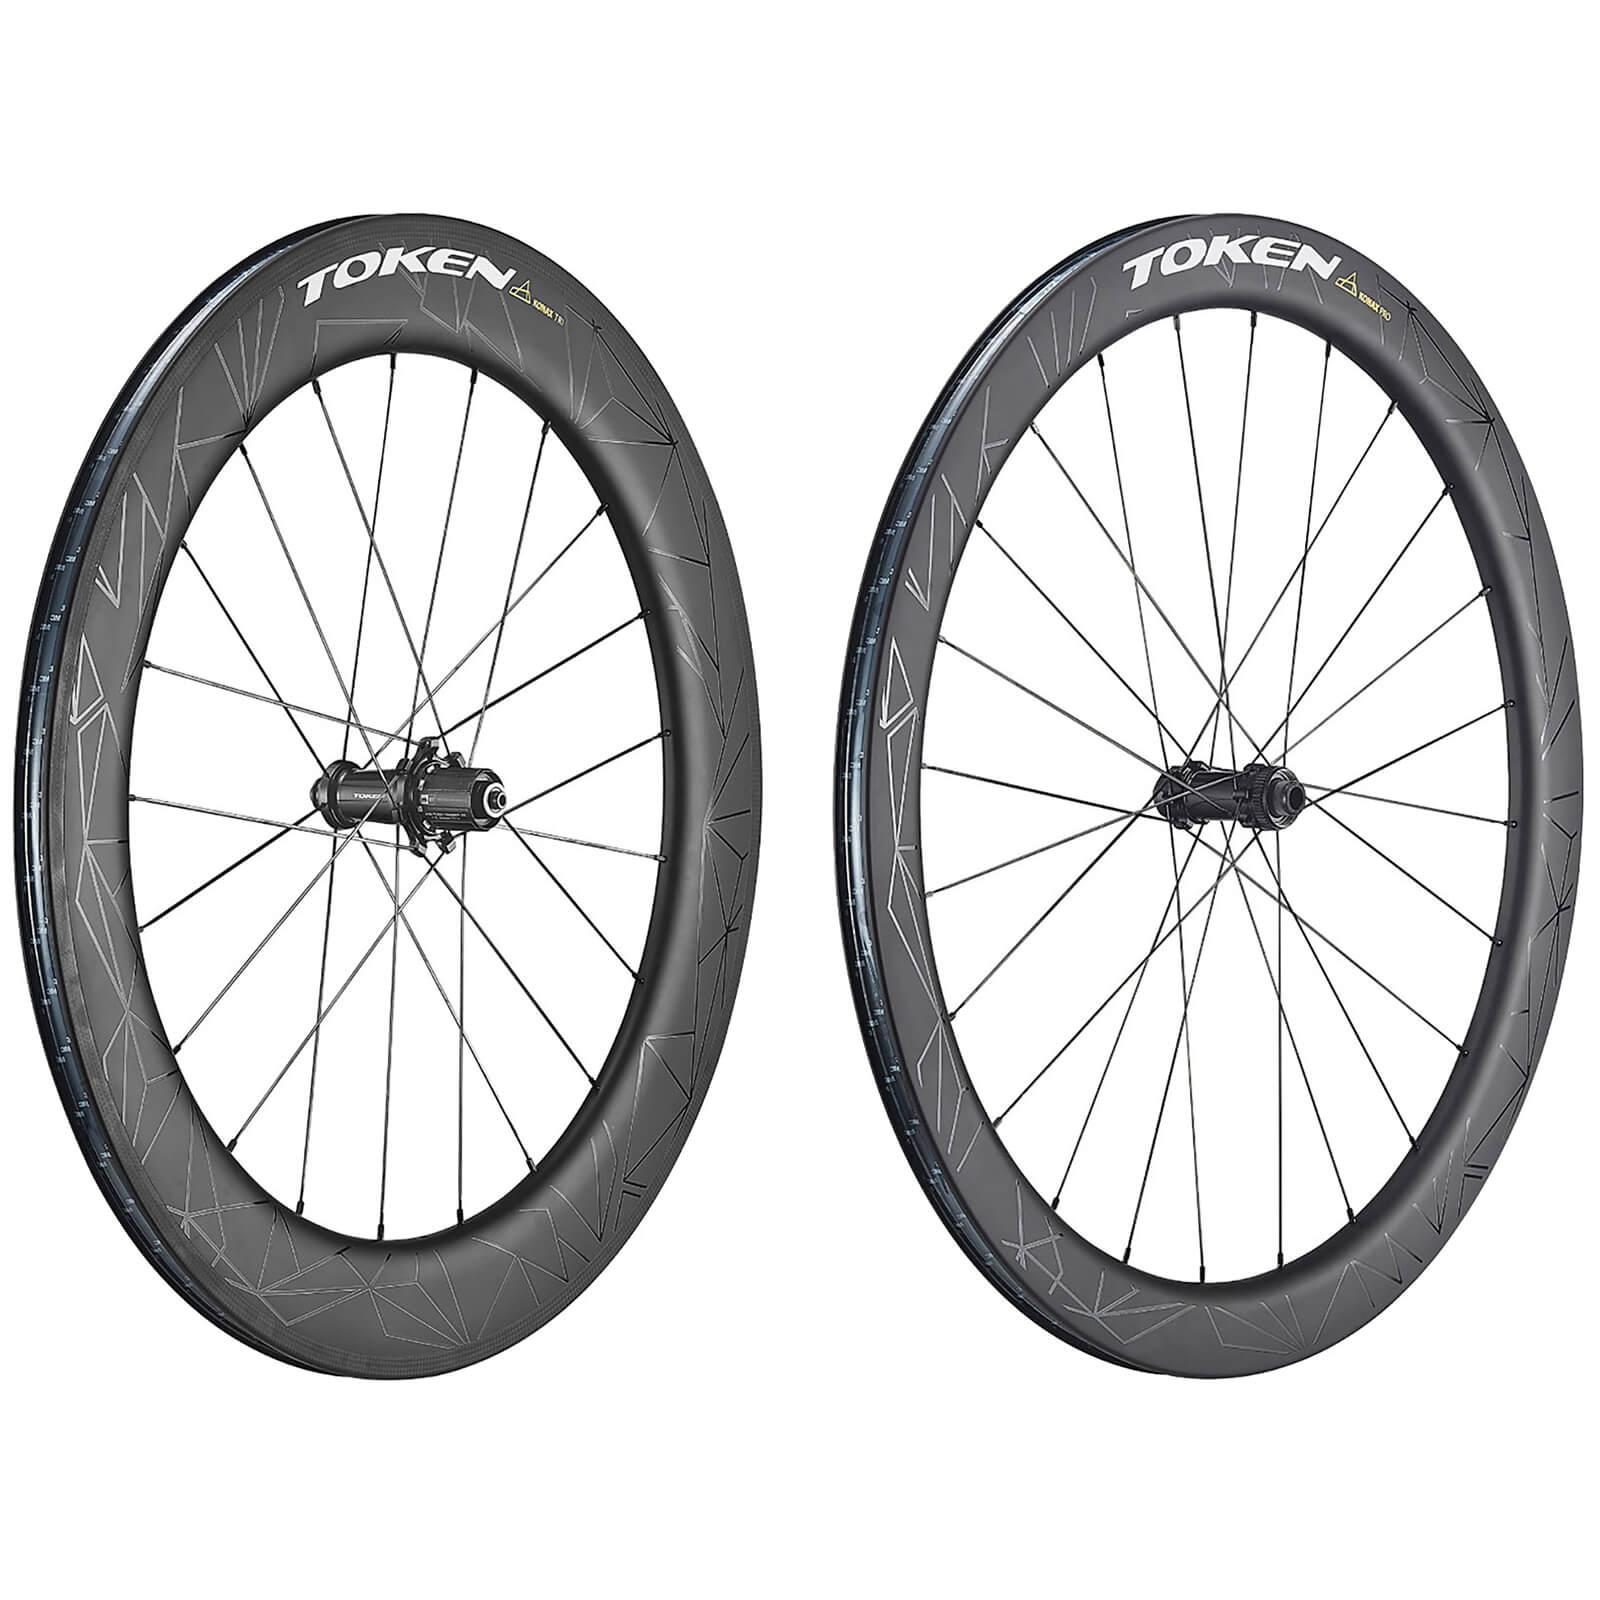 Token Konax Pro and Konax Tri Carbon Tubeless Ready Wheelset - Shimano